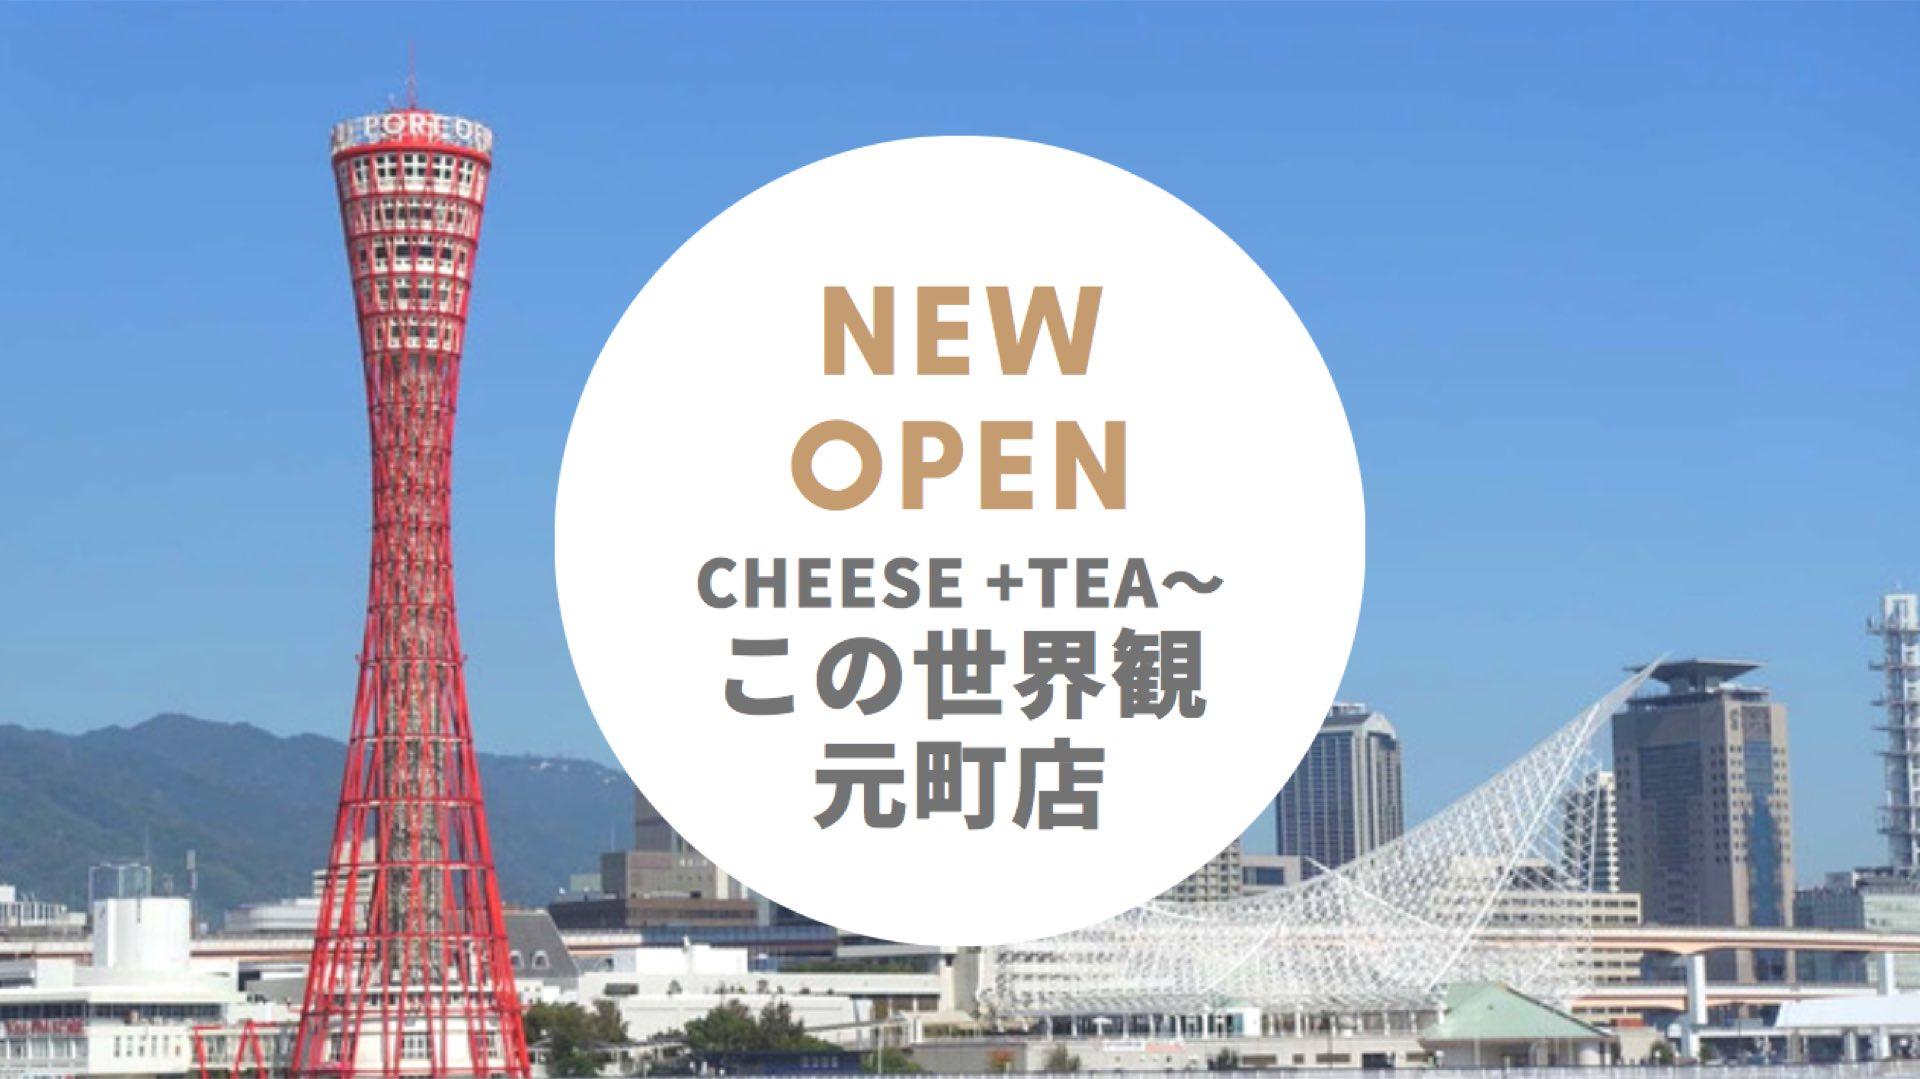 CHEESE +TEA〜 この世界観 元町店 − 注目のタピオカチーズティー専門店が神戸にもオープン!